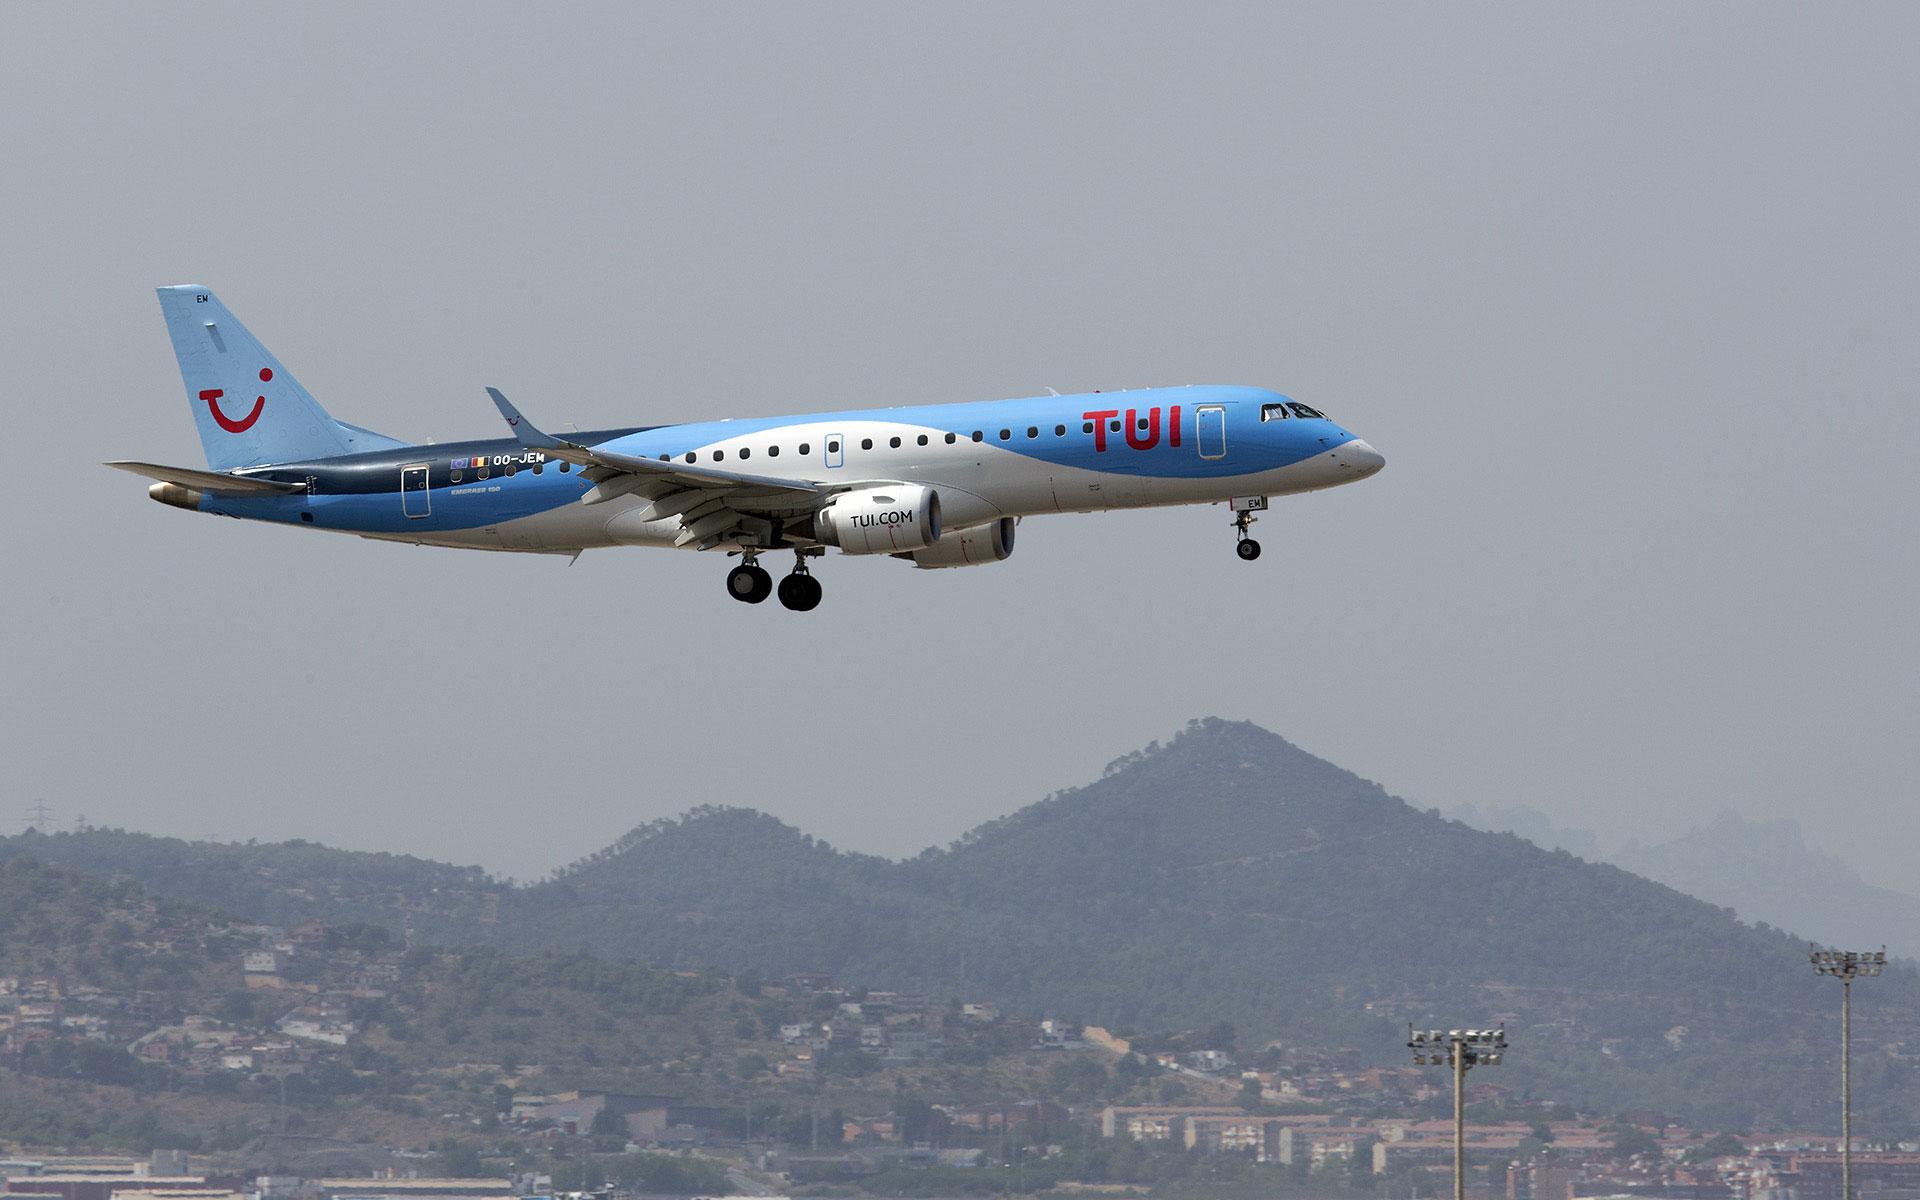 Un Embraer 190 aterrizando en Barcelona